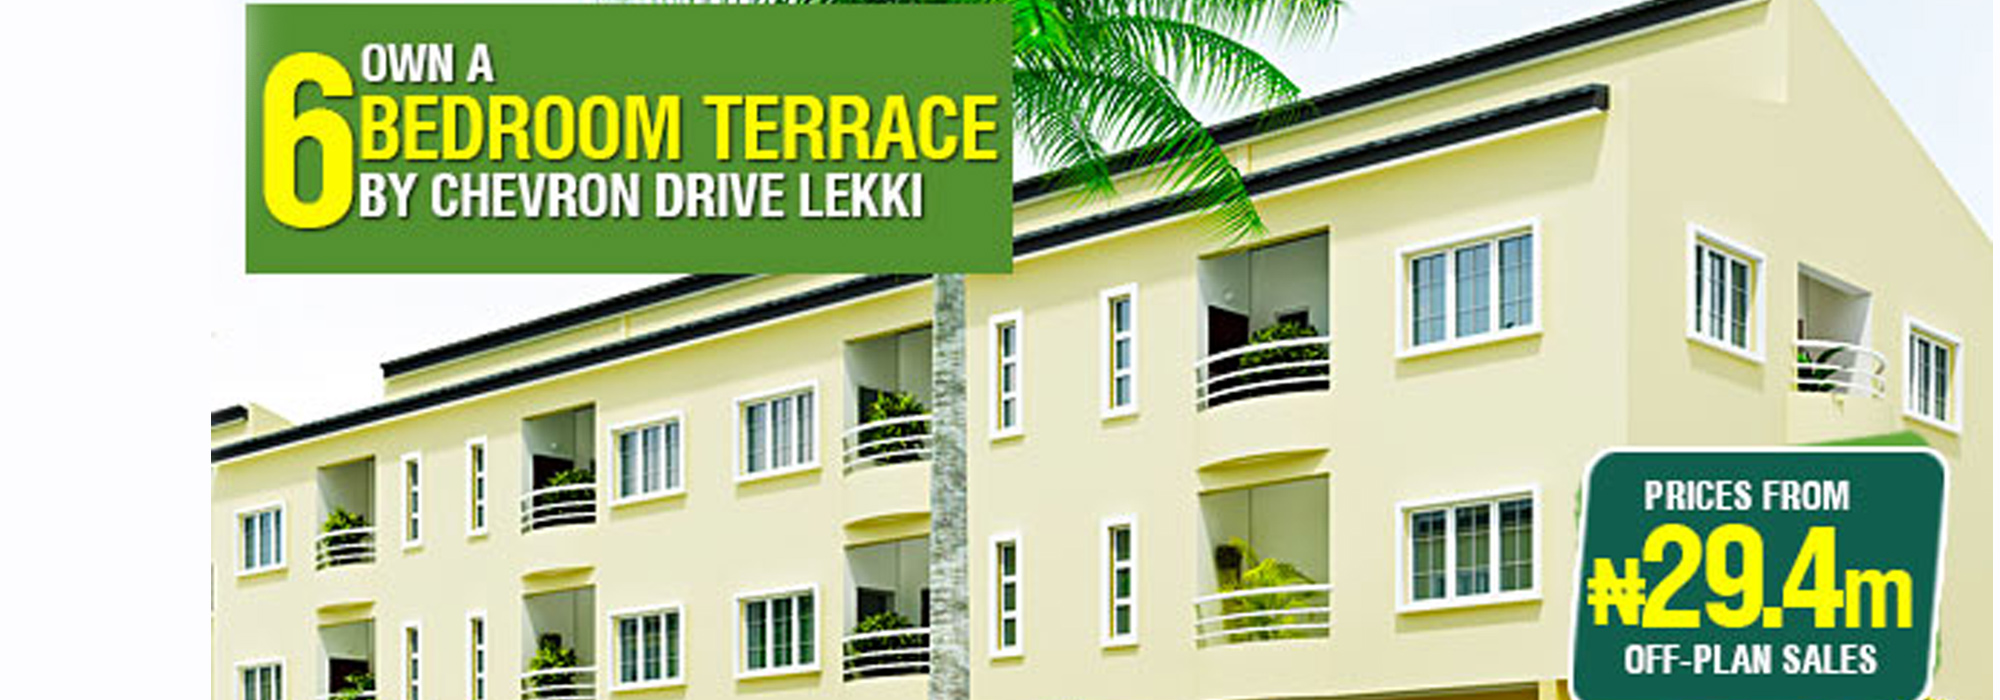 Lekki Gardens Estate, Lagos Nigeria